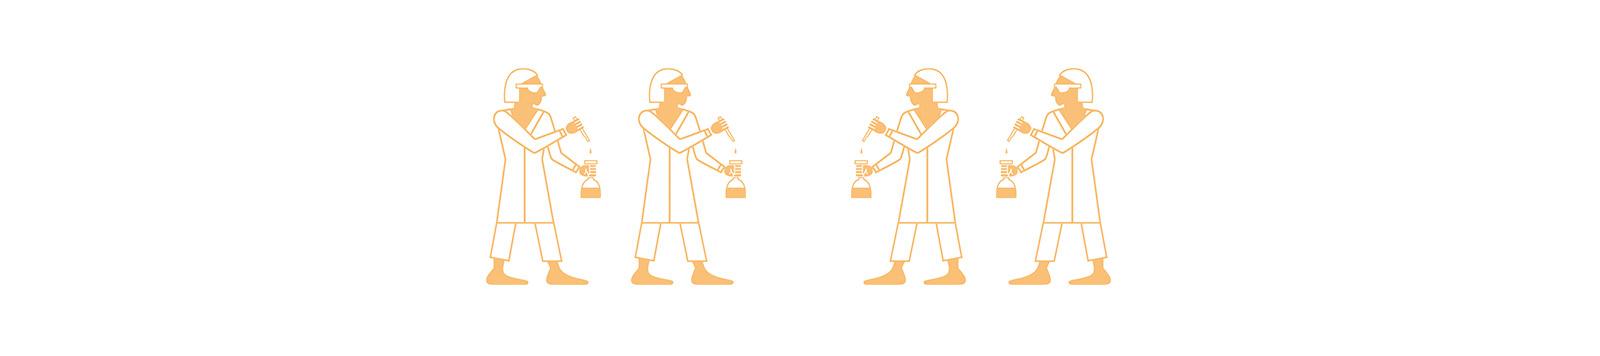 esLebeDerKoenig_hieroglyphe_07